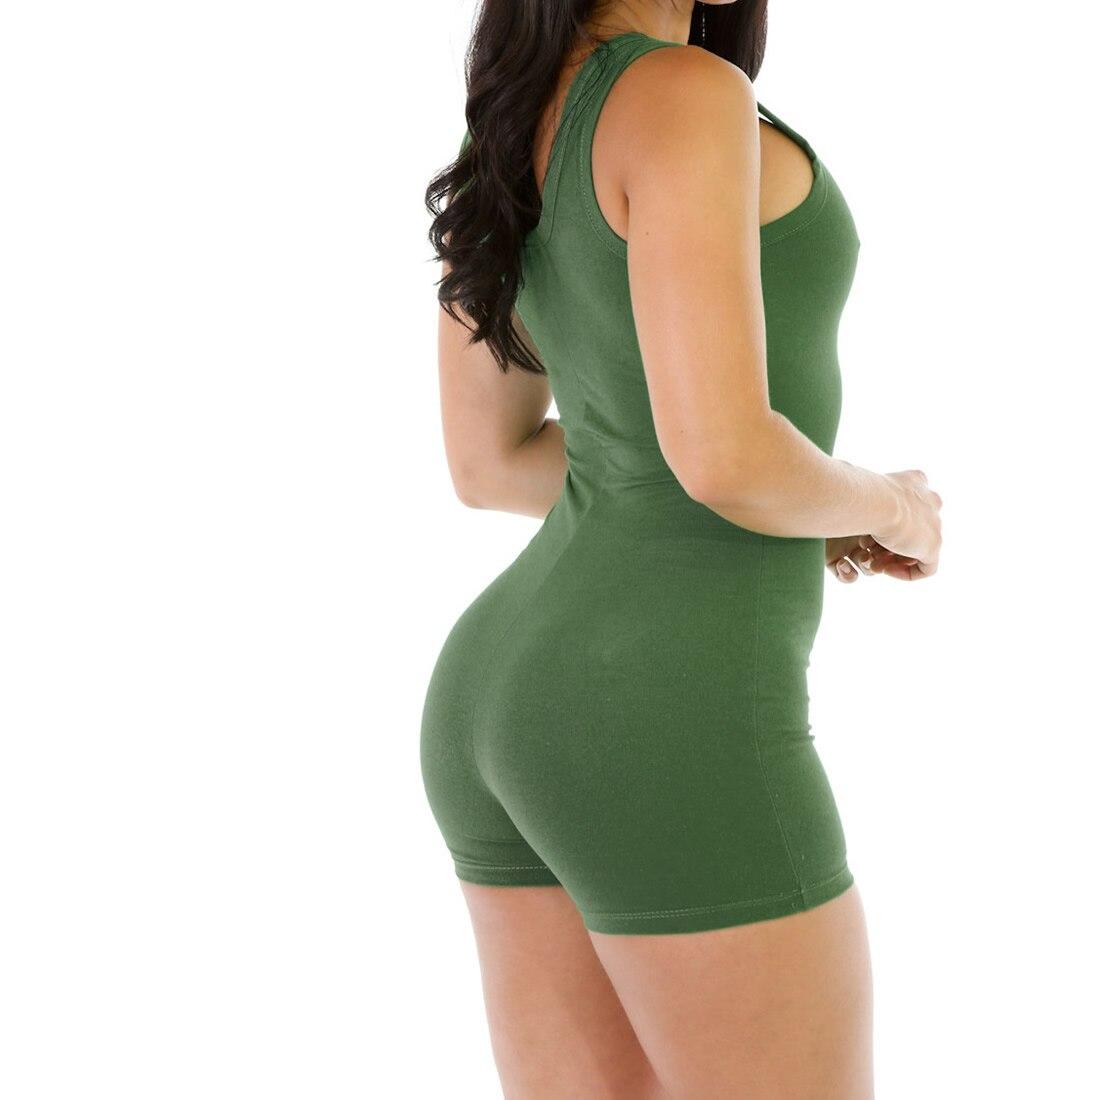 Women Summer Rompers Solid Sheath Slimming Jumpsuit Summer Short Overalls Jumpsuit Female Cotton Playsuit Plus size XL